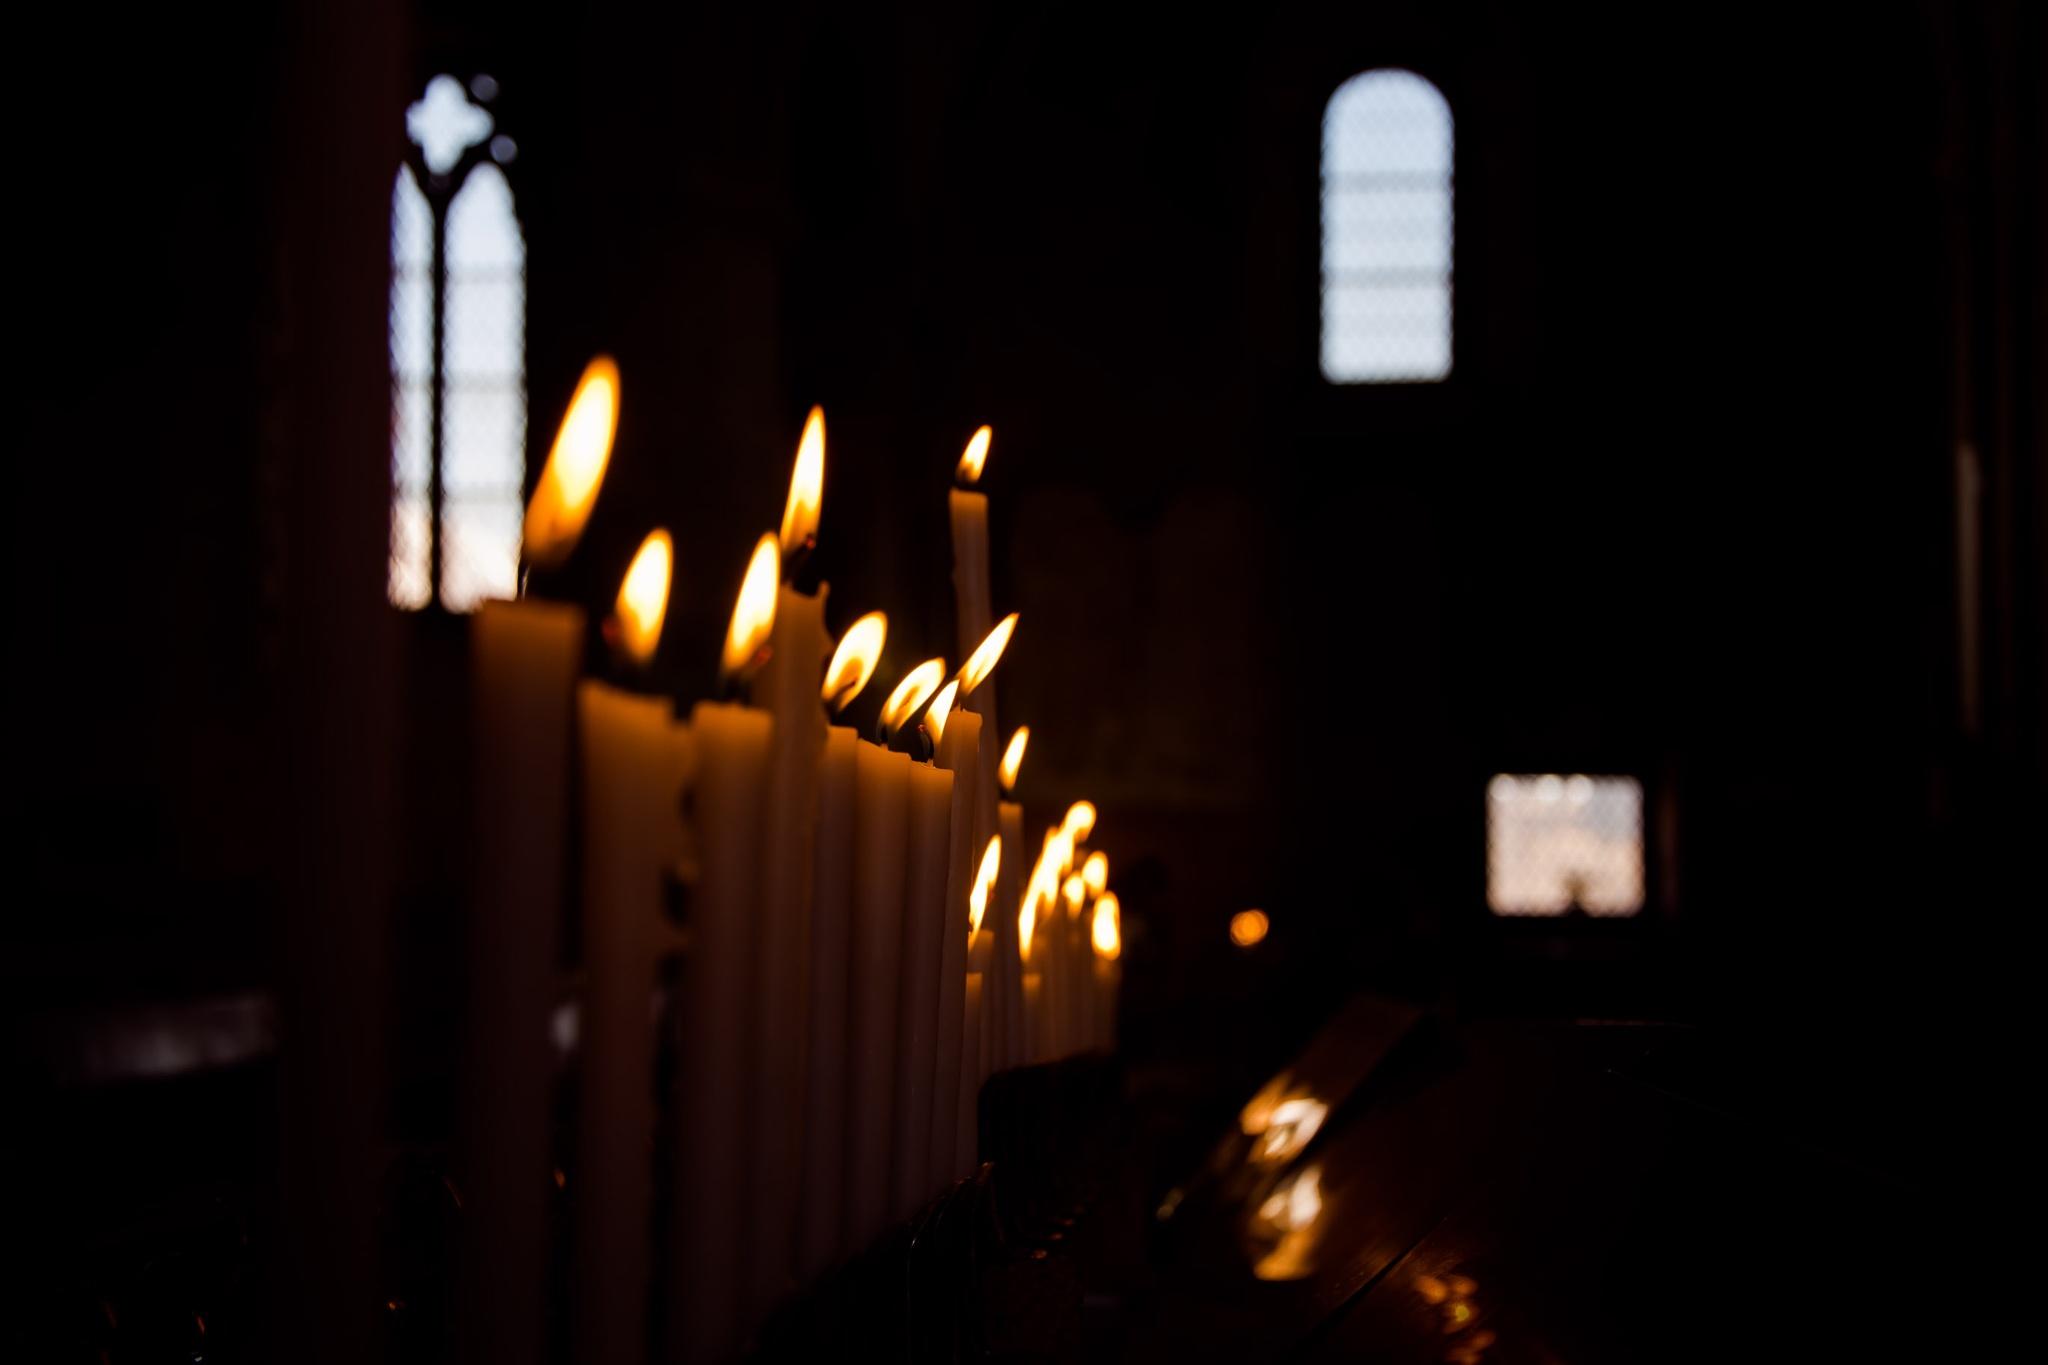 candele sul sacrato by Luca Freni